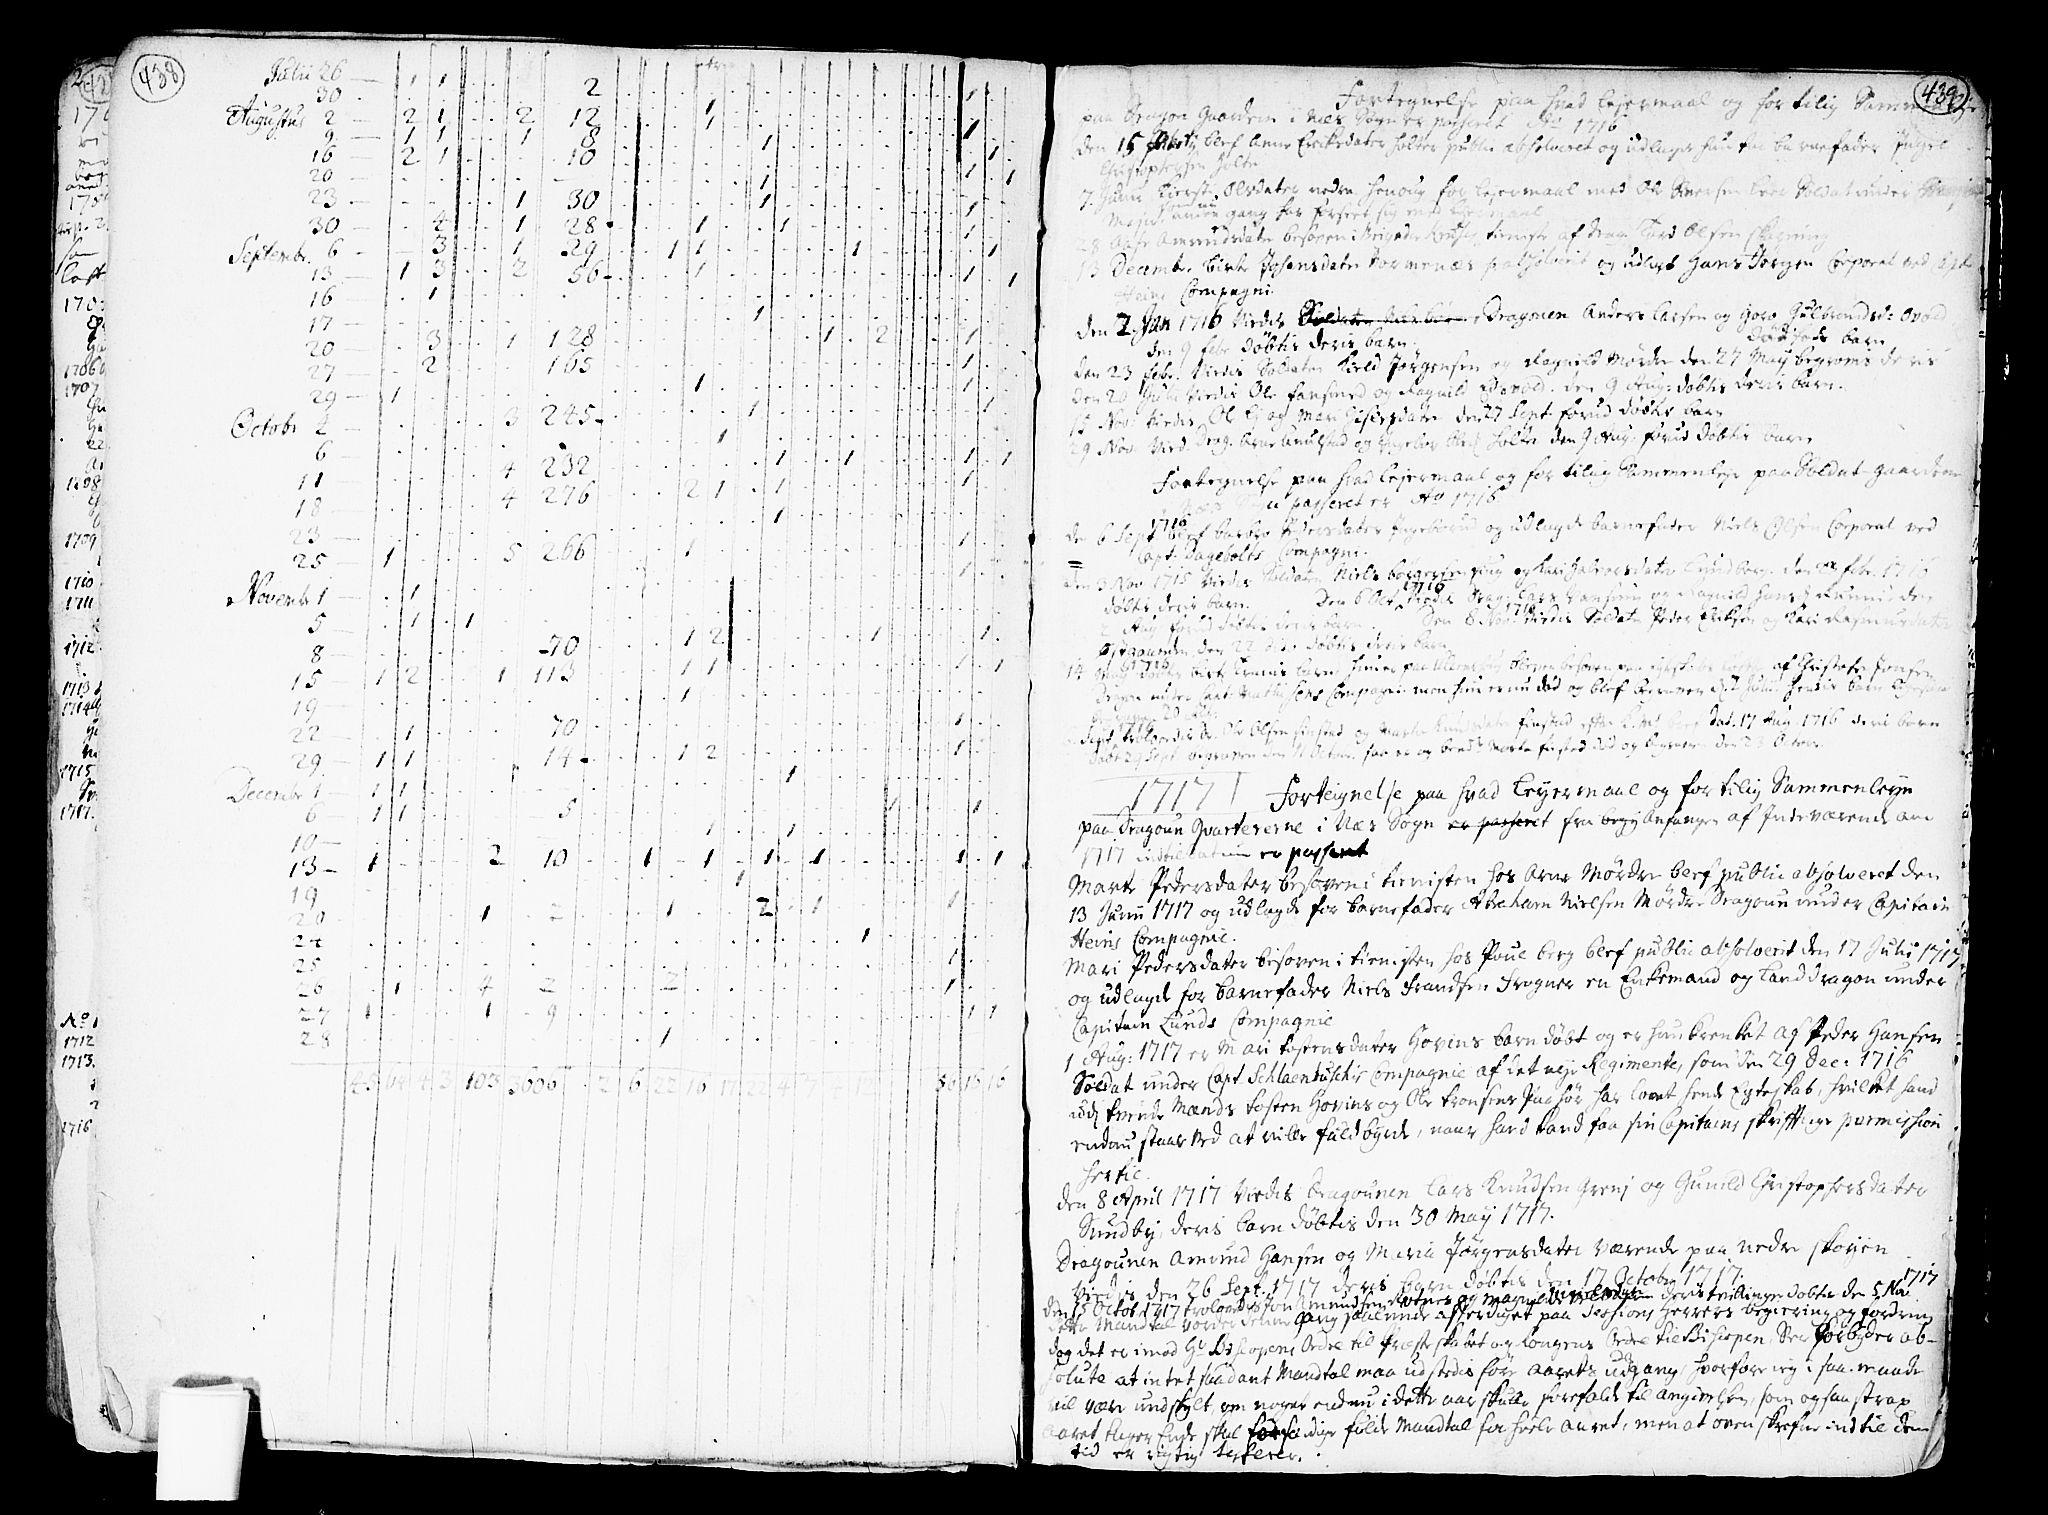 SAO, Nes prestekontor Kirkebøker, F/Fa/L0001: Parish register (official) no. I 1, 1689-1716, p. 438